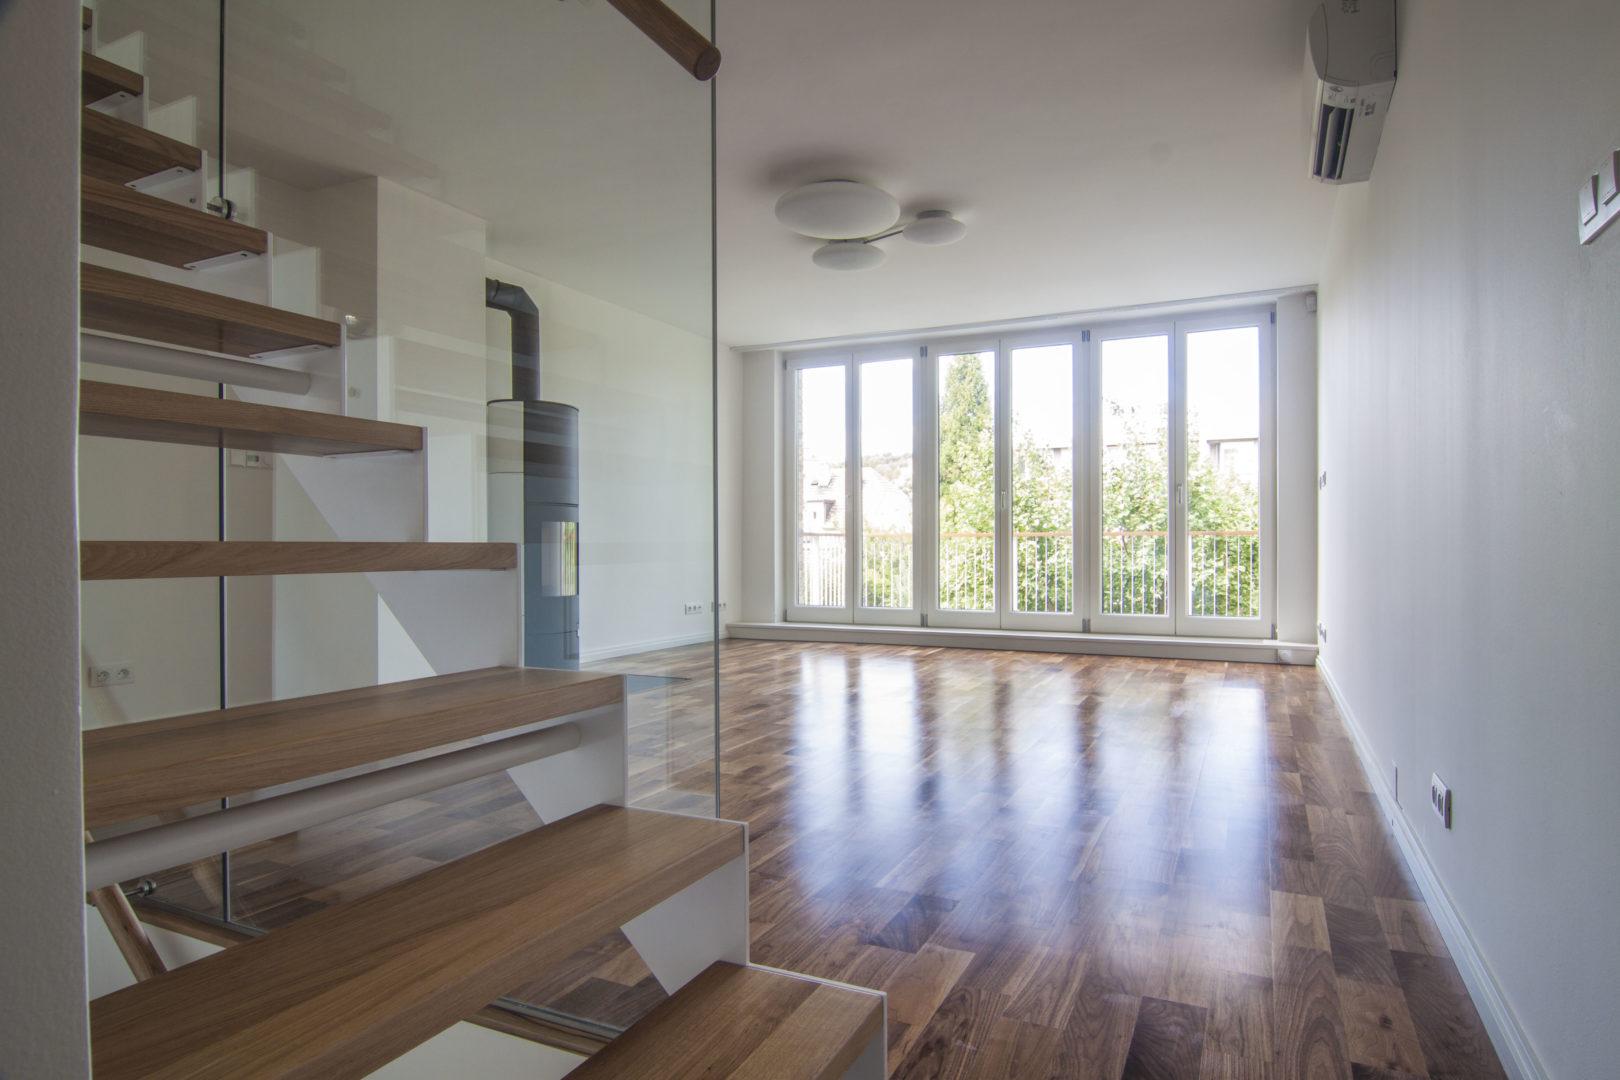 rekonstrukce domu interiér